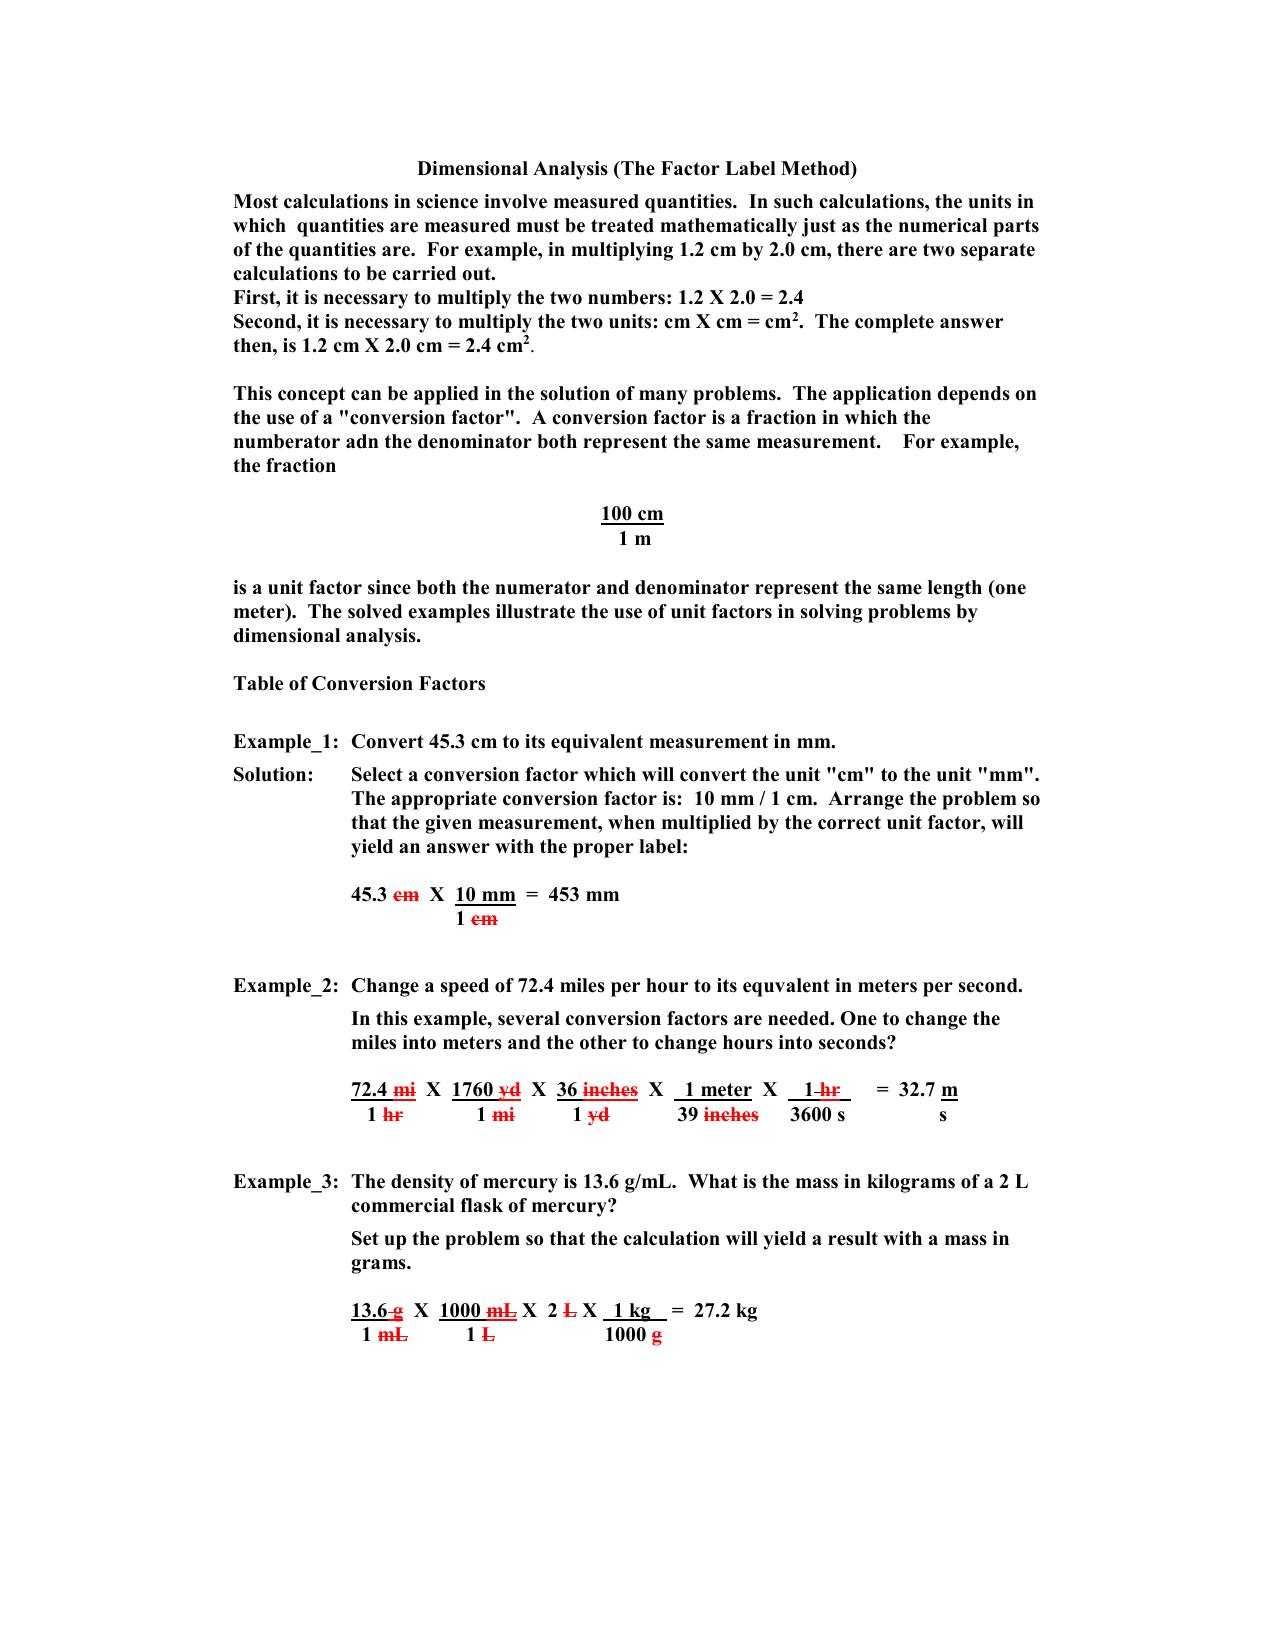 33 Dimensionalysis Factor Label Method Worksheet